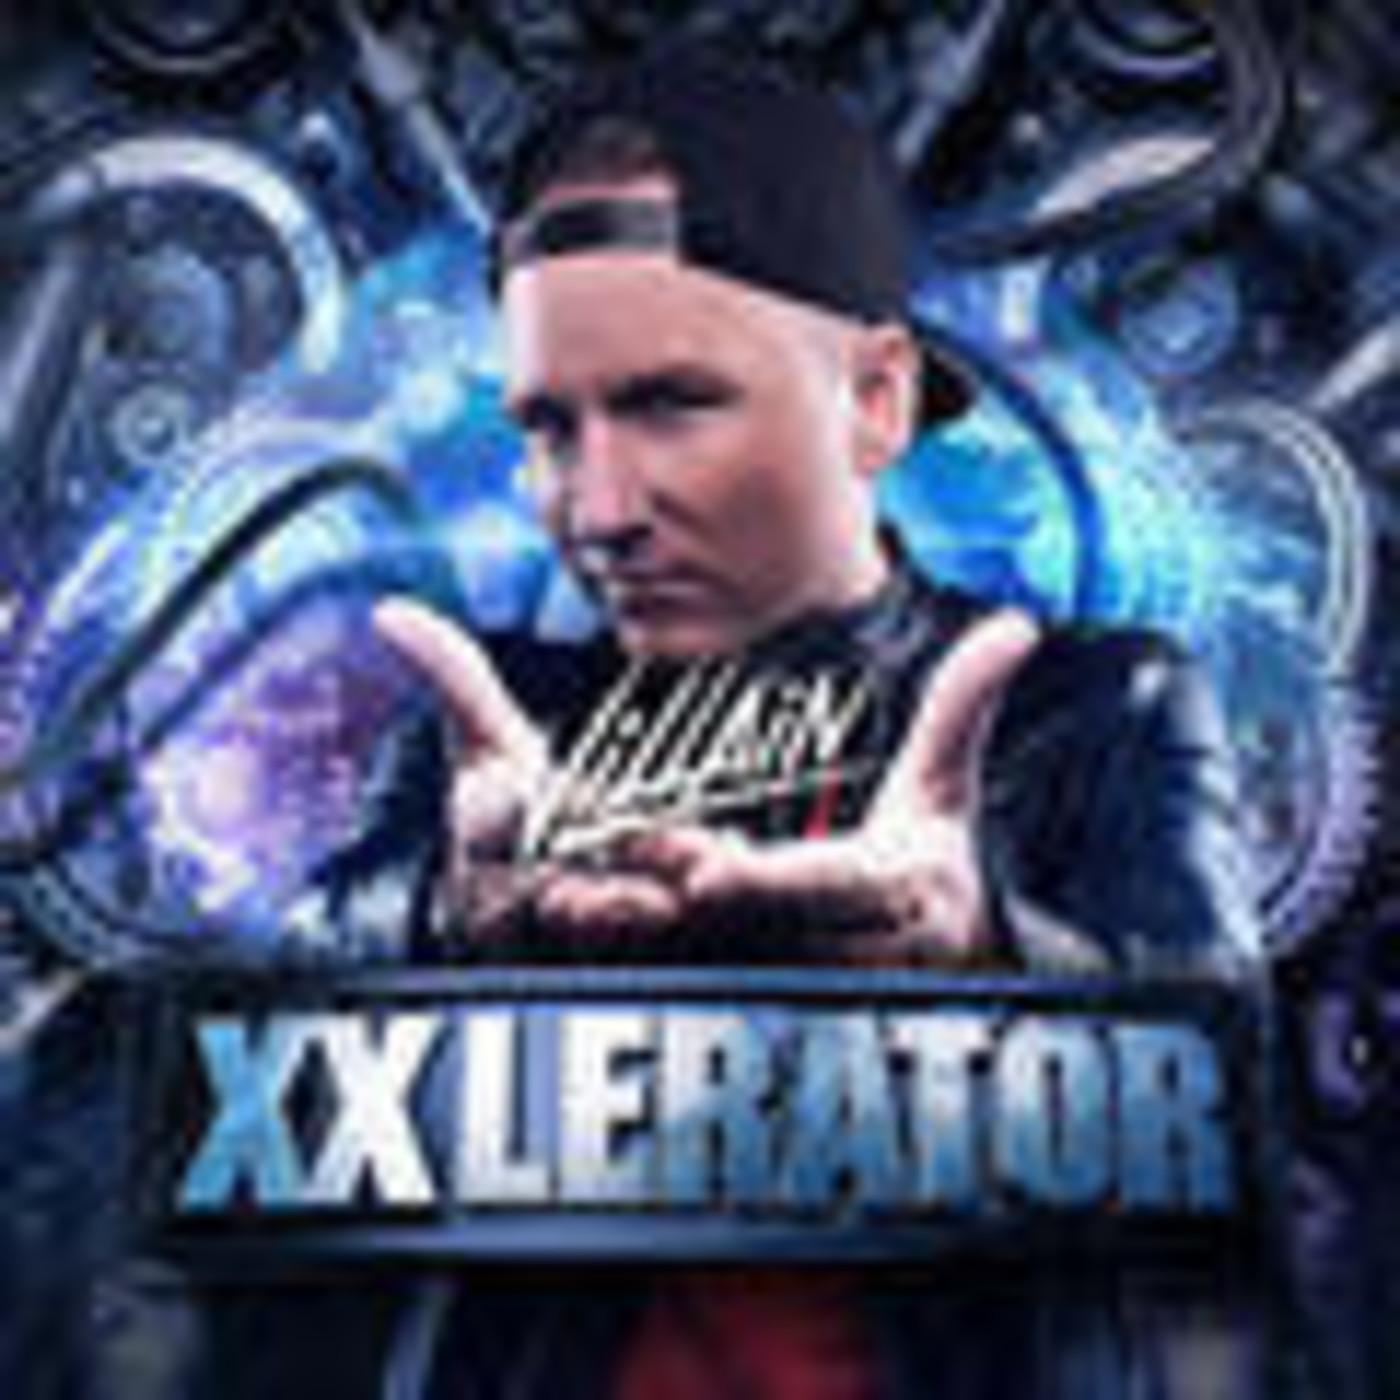 XXlerator